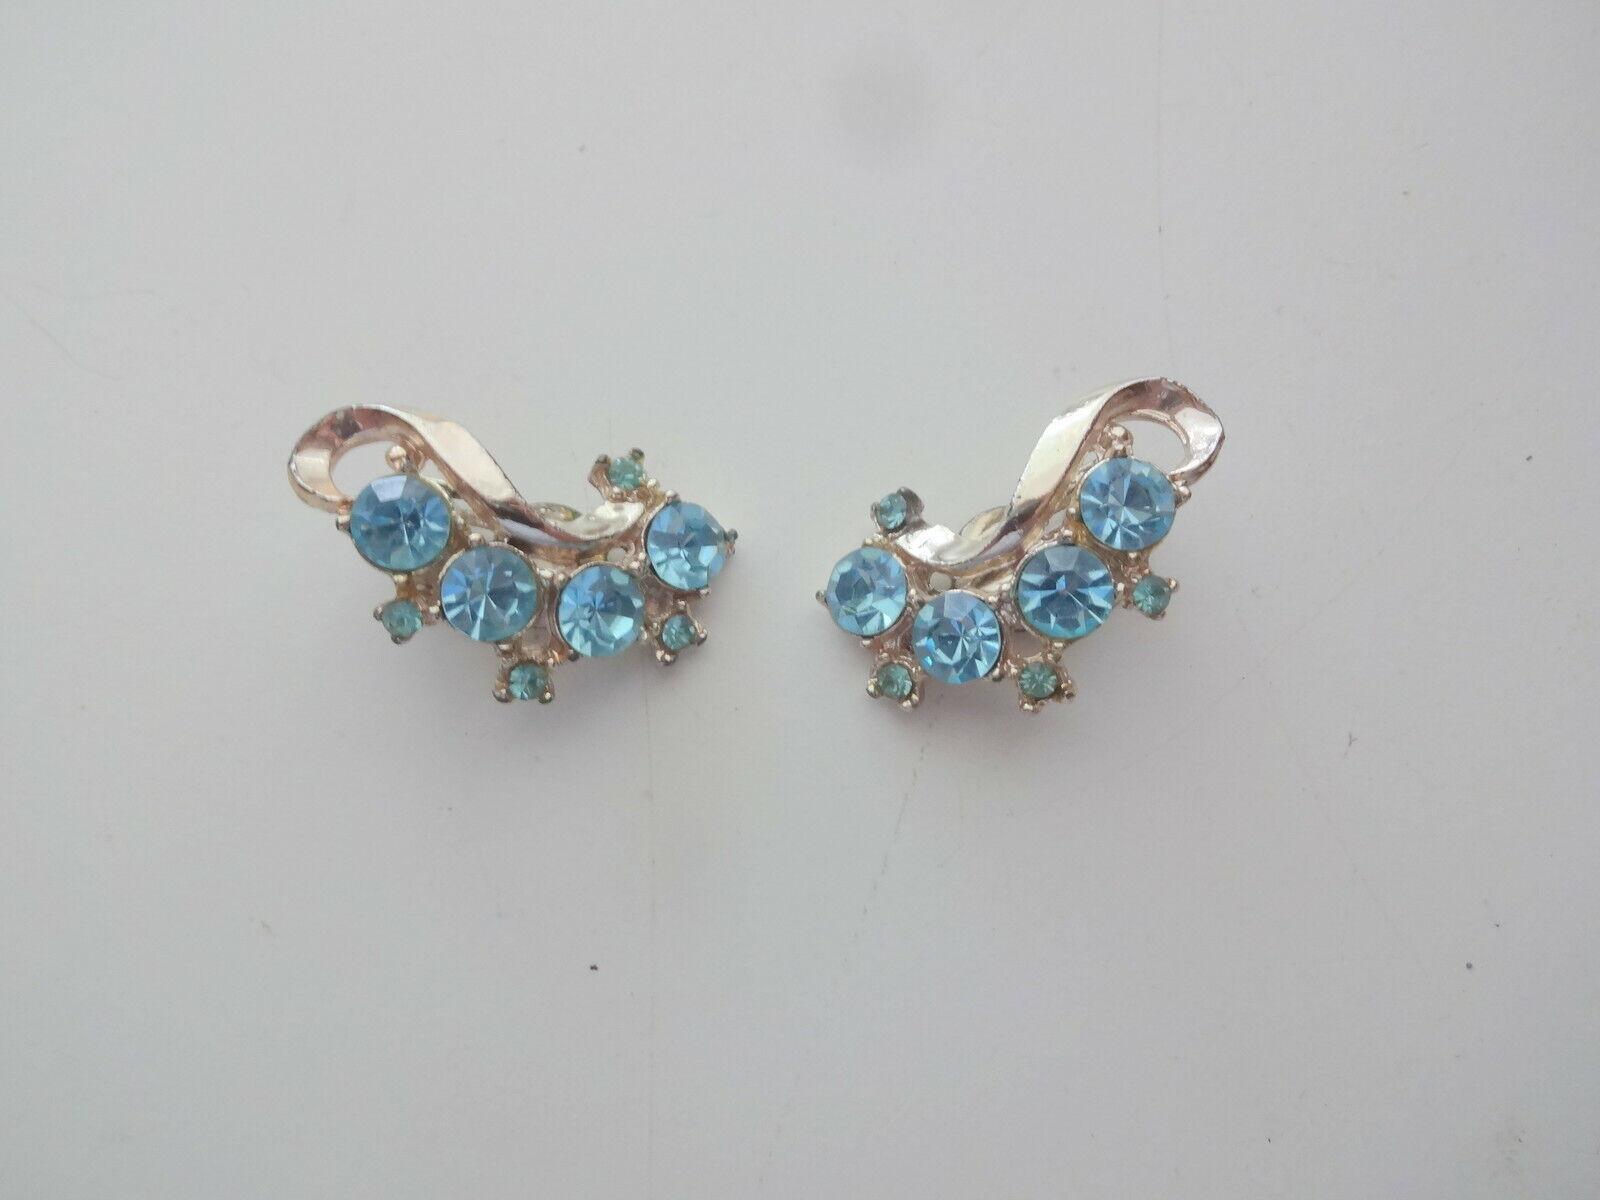 Vtg Aqua Blue Rhinestone Clip On Earrings - image 2